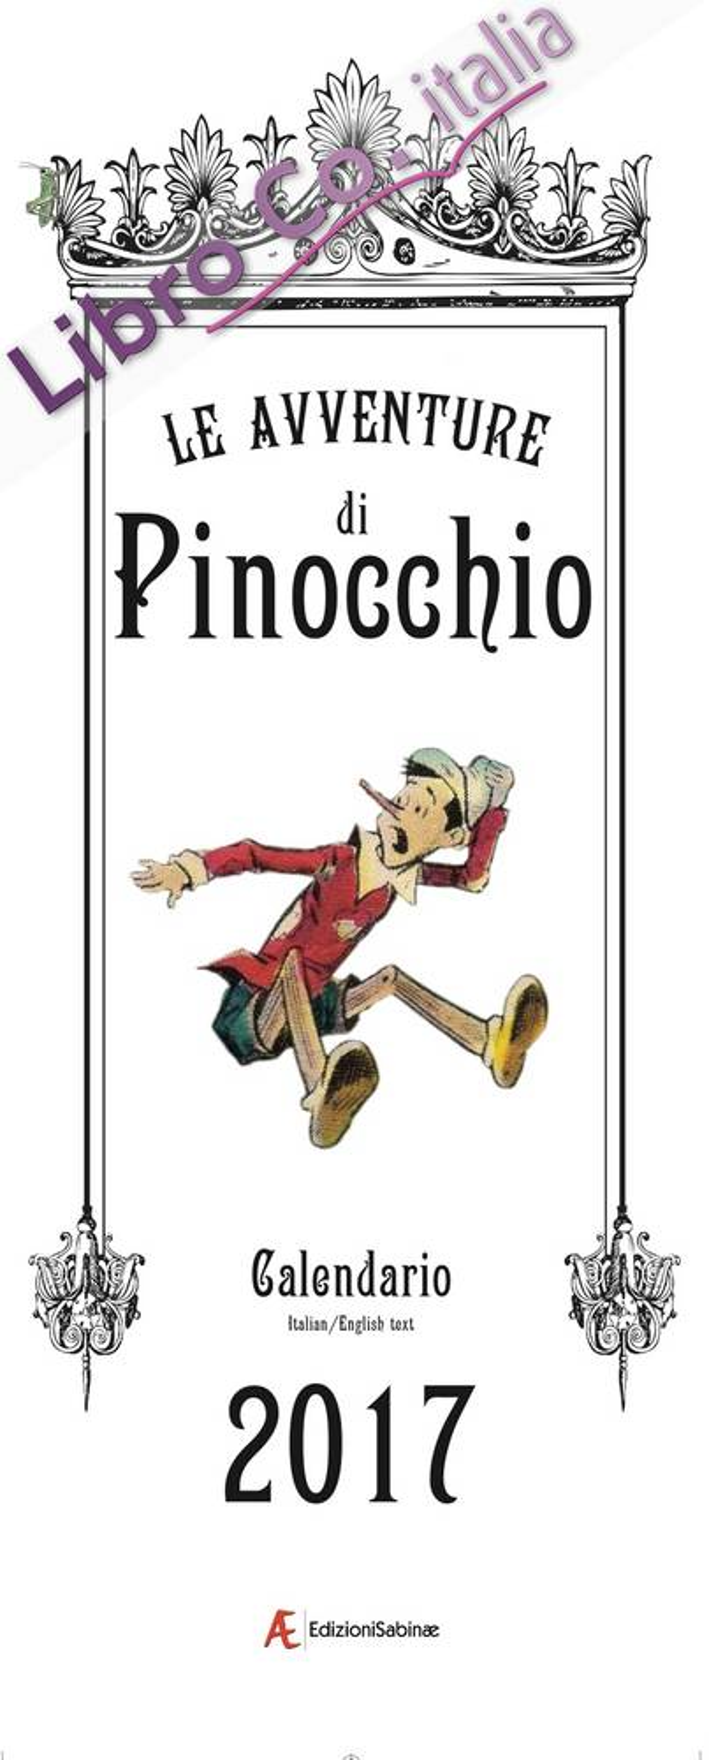 Calendario 2017 Pinocchio. Ediz. Italiana e Inglese.